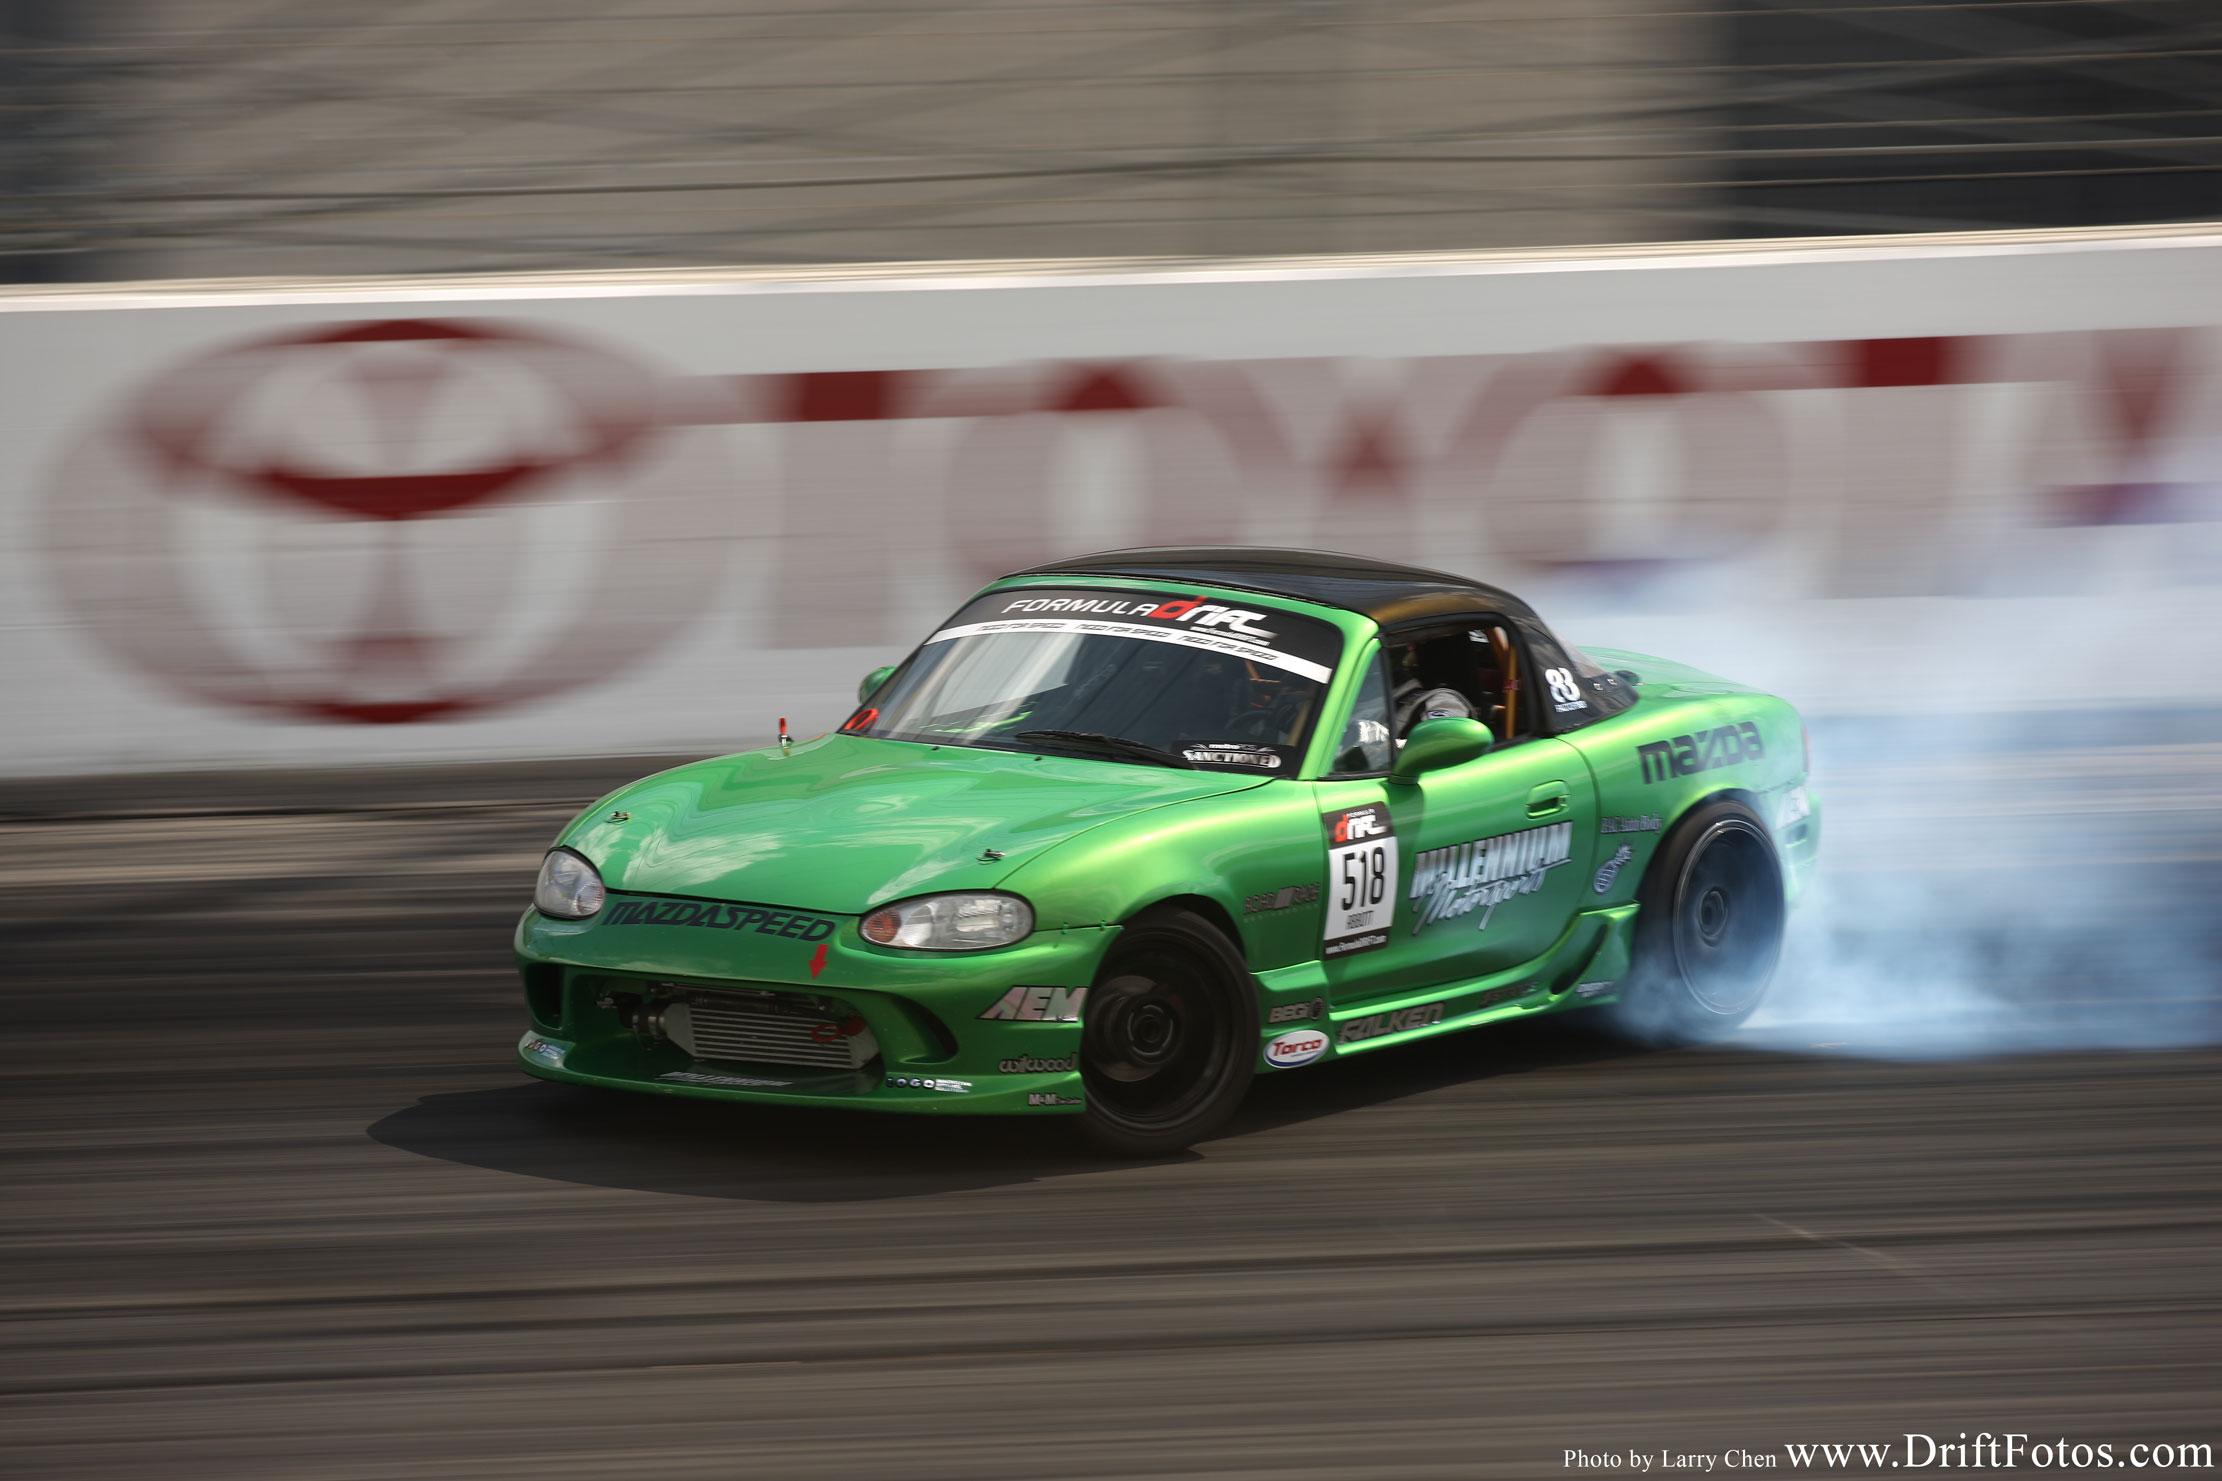 Jeff Abbott Miata Drifting